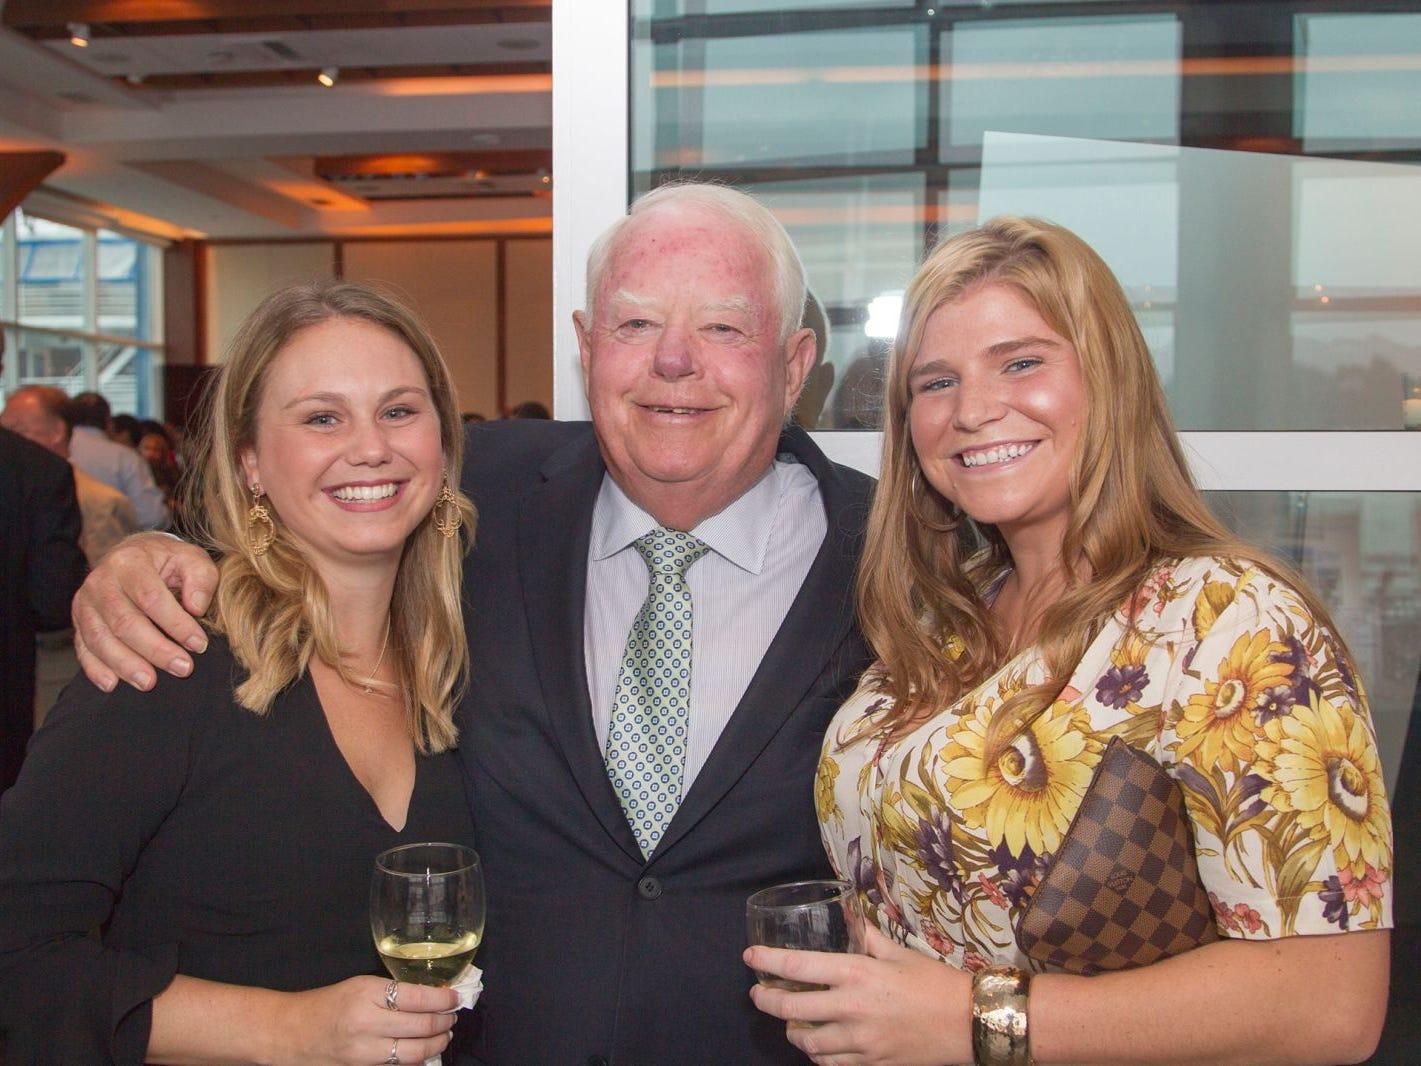 Molly Bascio, Tim Higgins, Alex Carrick. 11th annual IronMatt Fundraiser Gala at Pier 60 Chelsea Piers. 09/20/2018